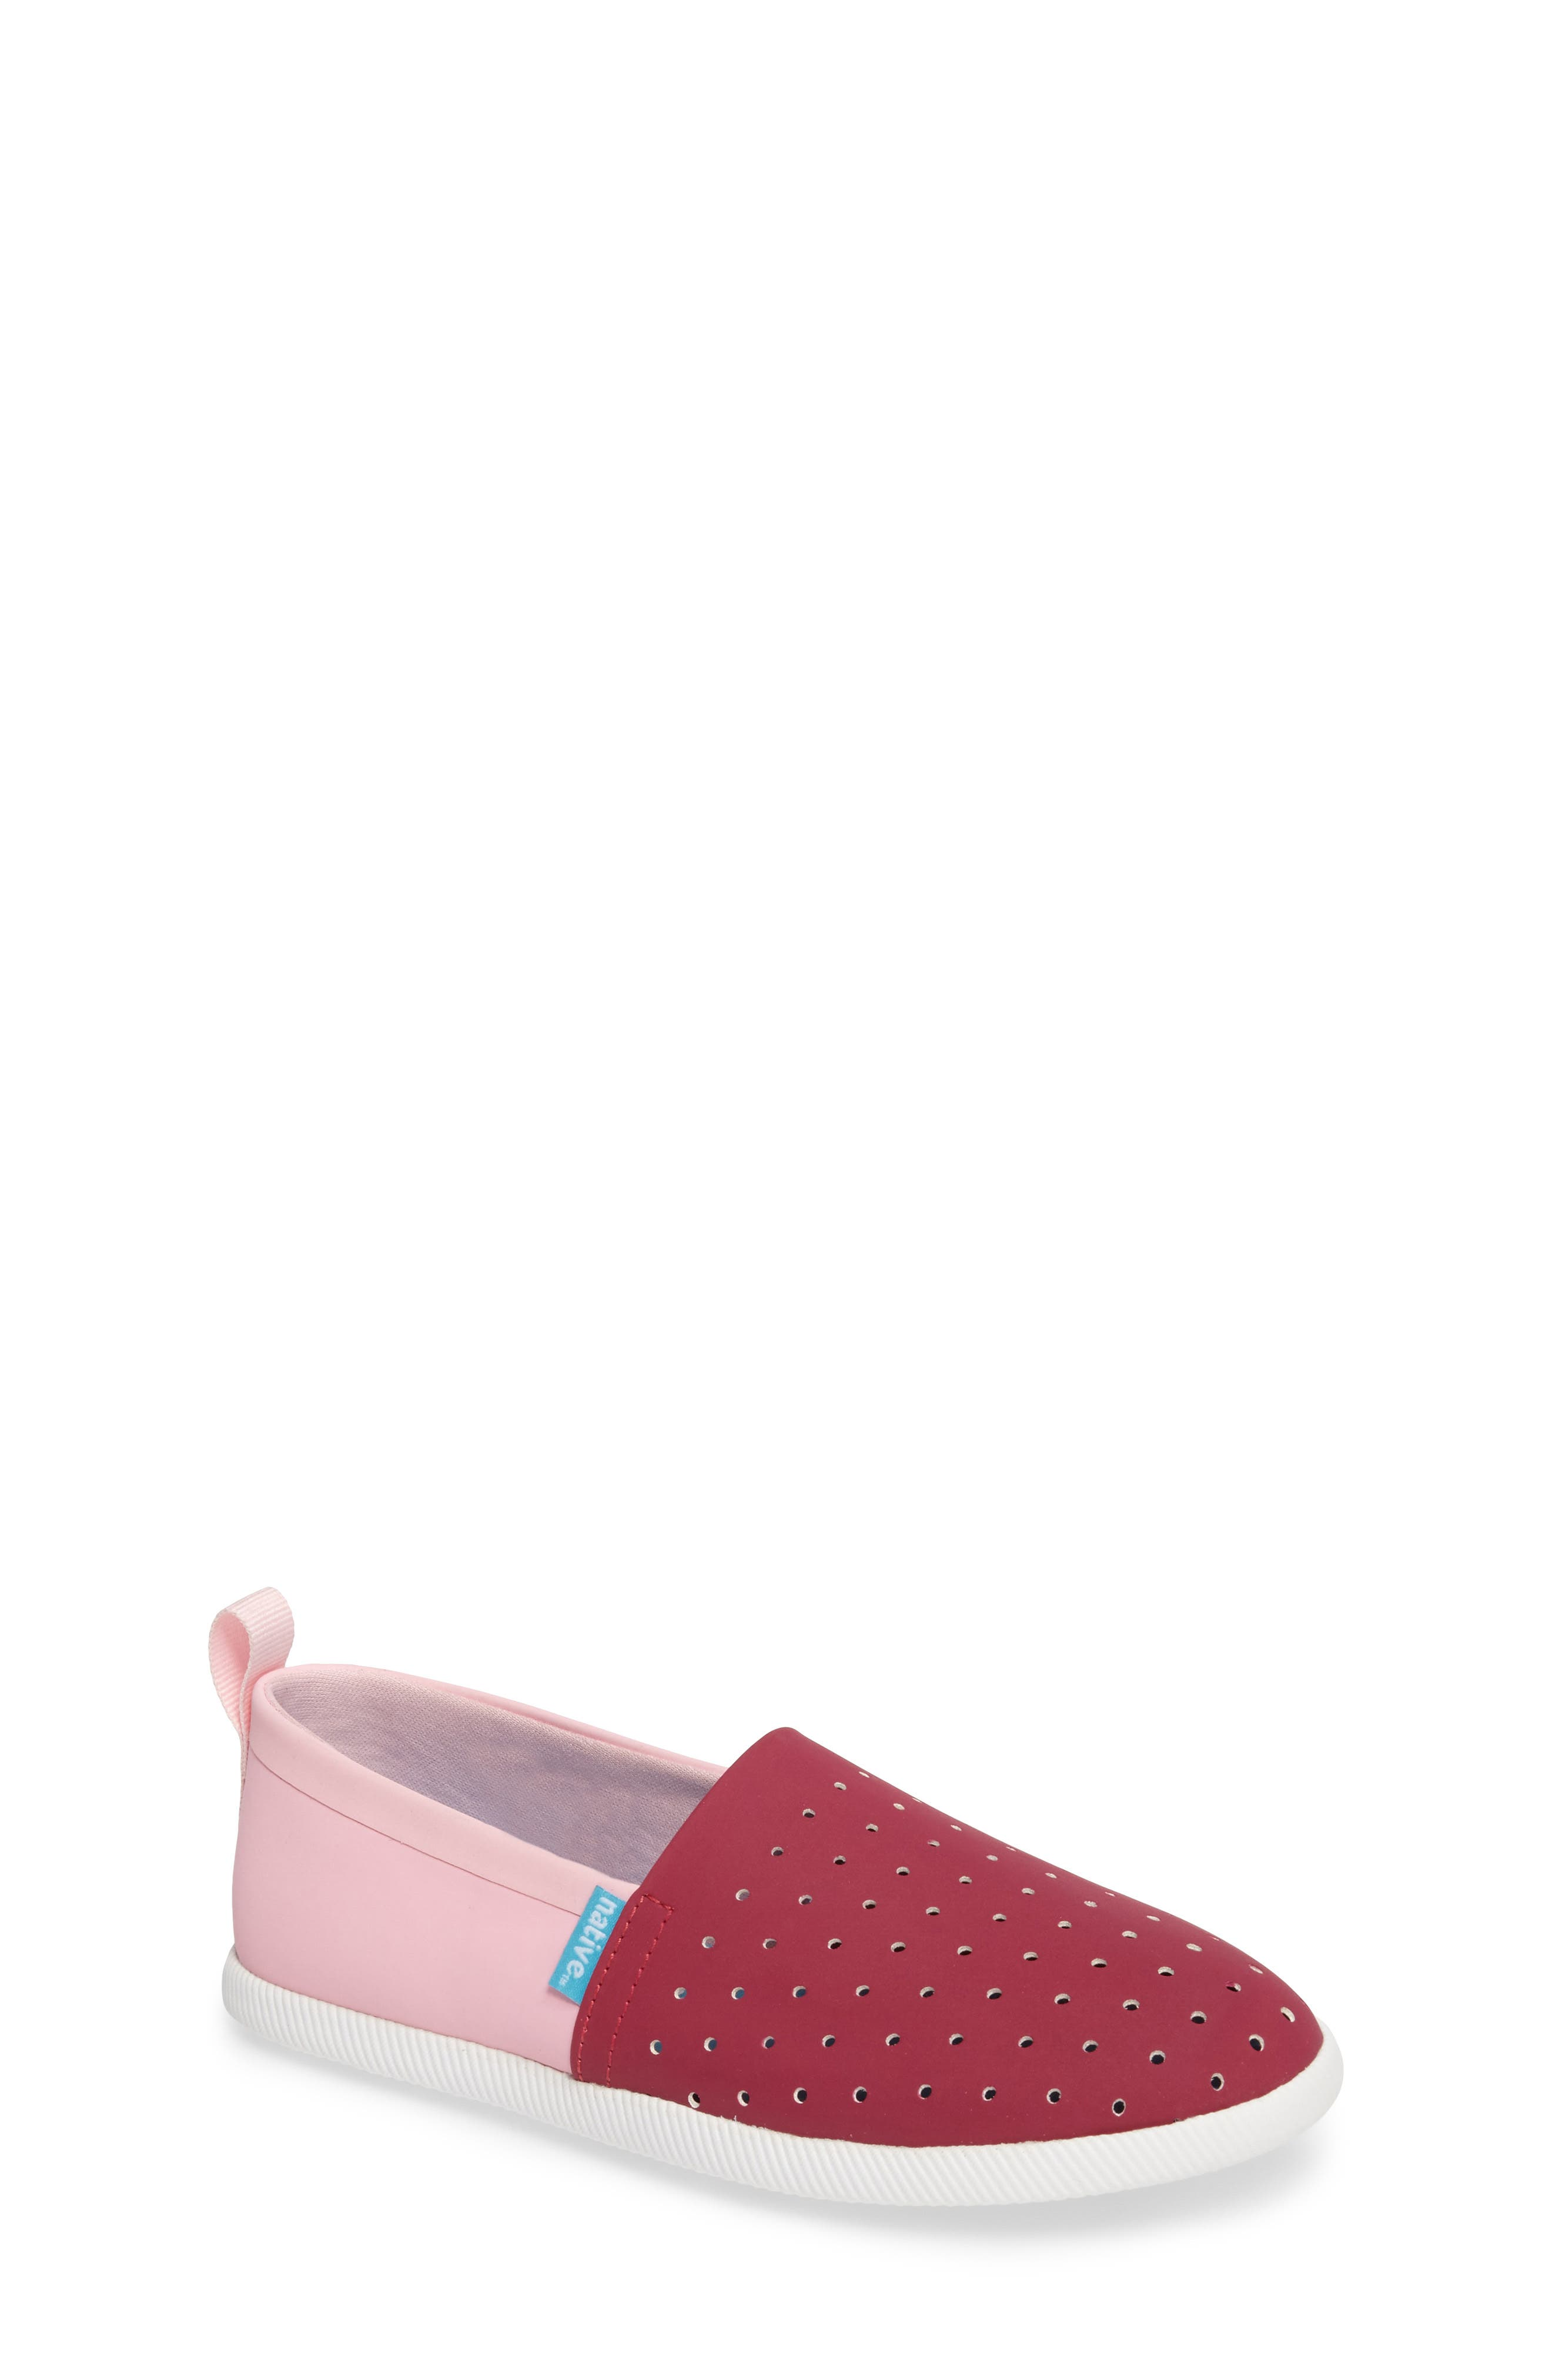 Alternate Image 1 Selected - Native Shoes 'Venice' Slip-On (Baby, Walker, Toddler & Little Kid)